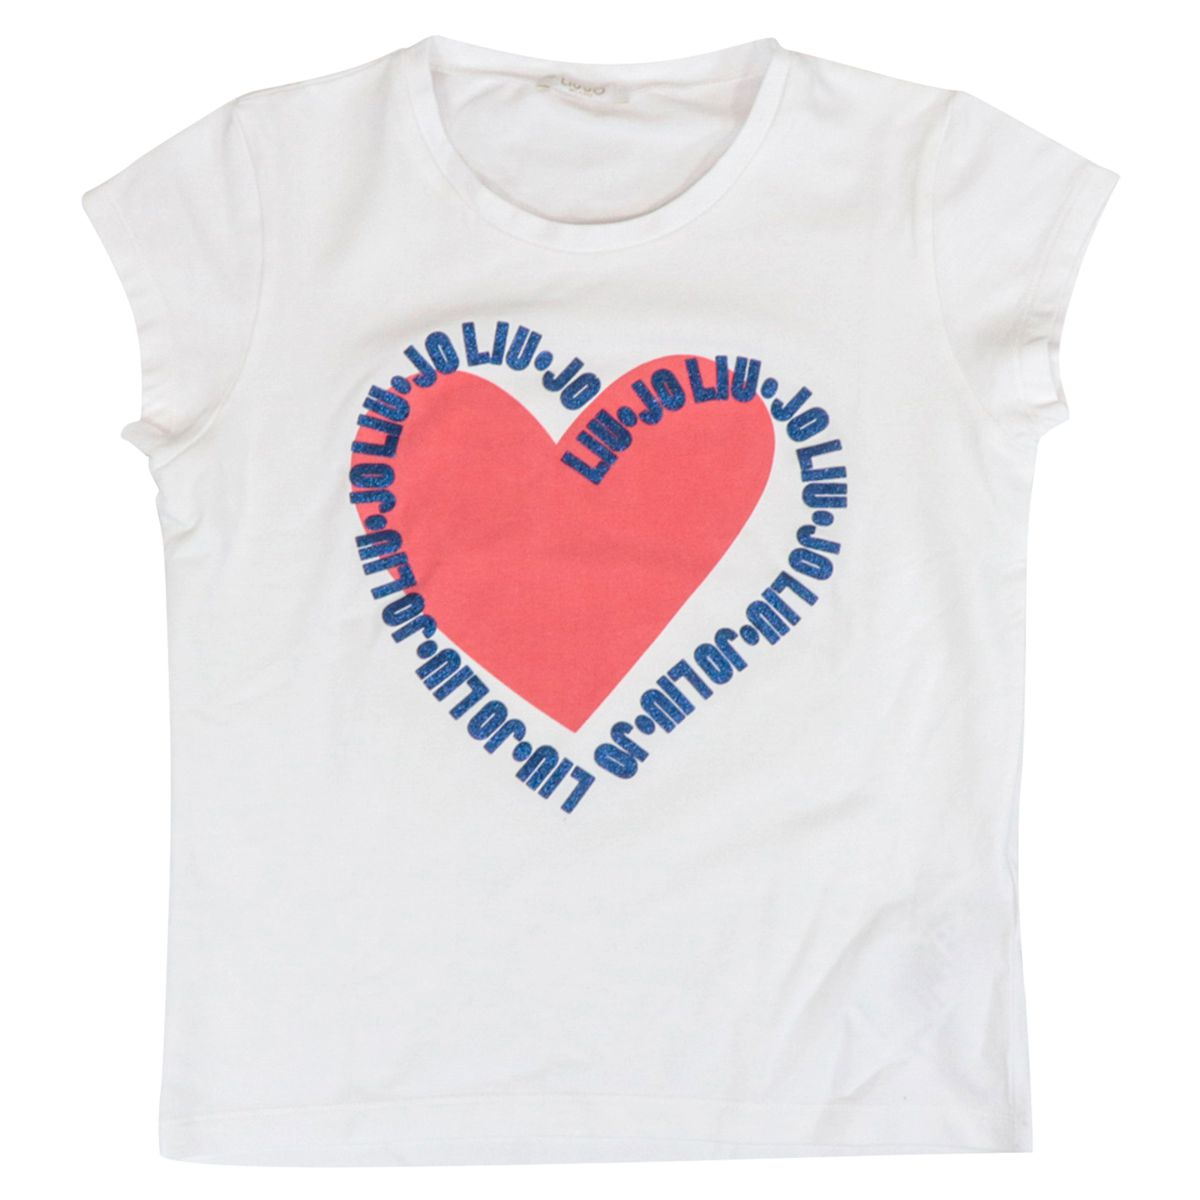 Cotton jersey T-shirt with heart print and glitter logo. White Liu Jo